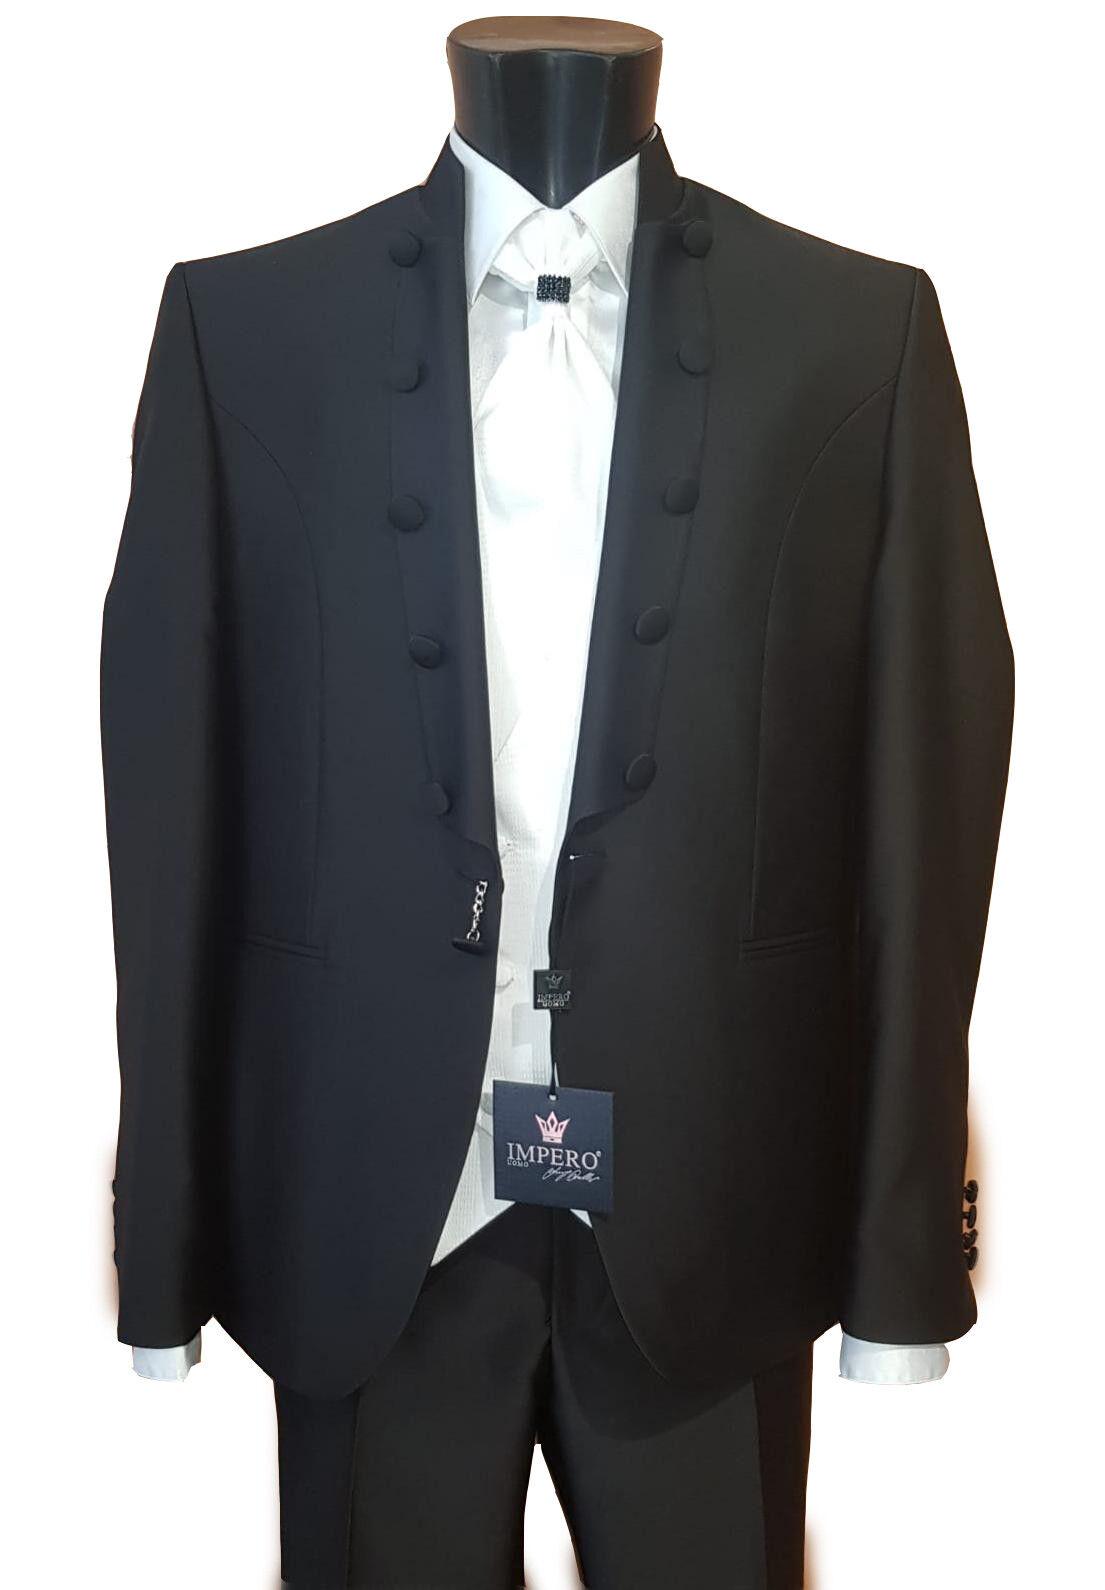 Abito  Herren Impero nero con gilet bianco 58 elegant dress robe élégante elegantes